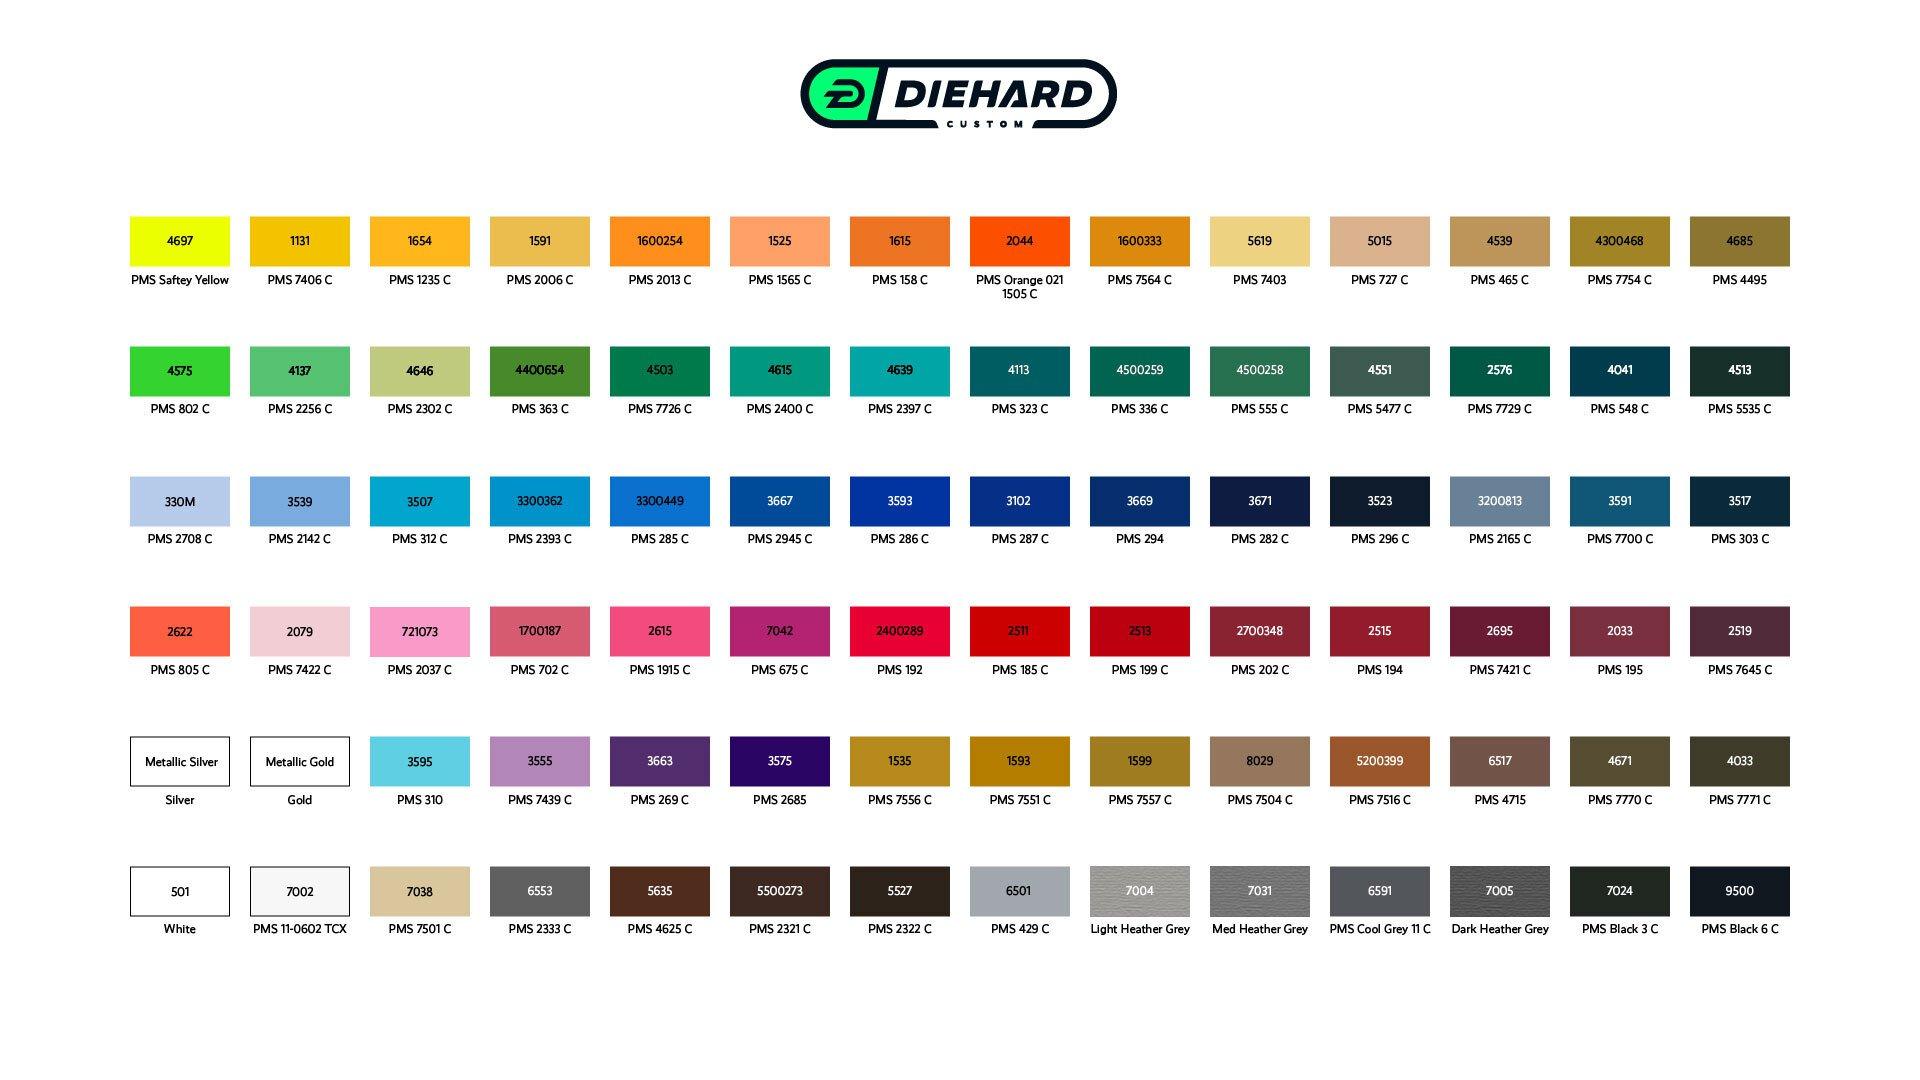 Diehard Custom yarn color chart for custom apparel